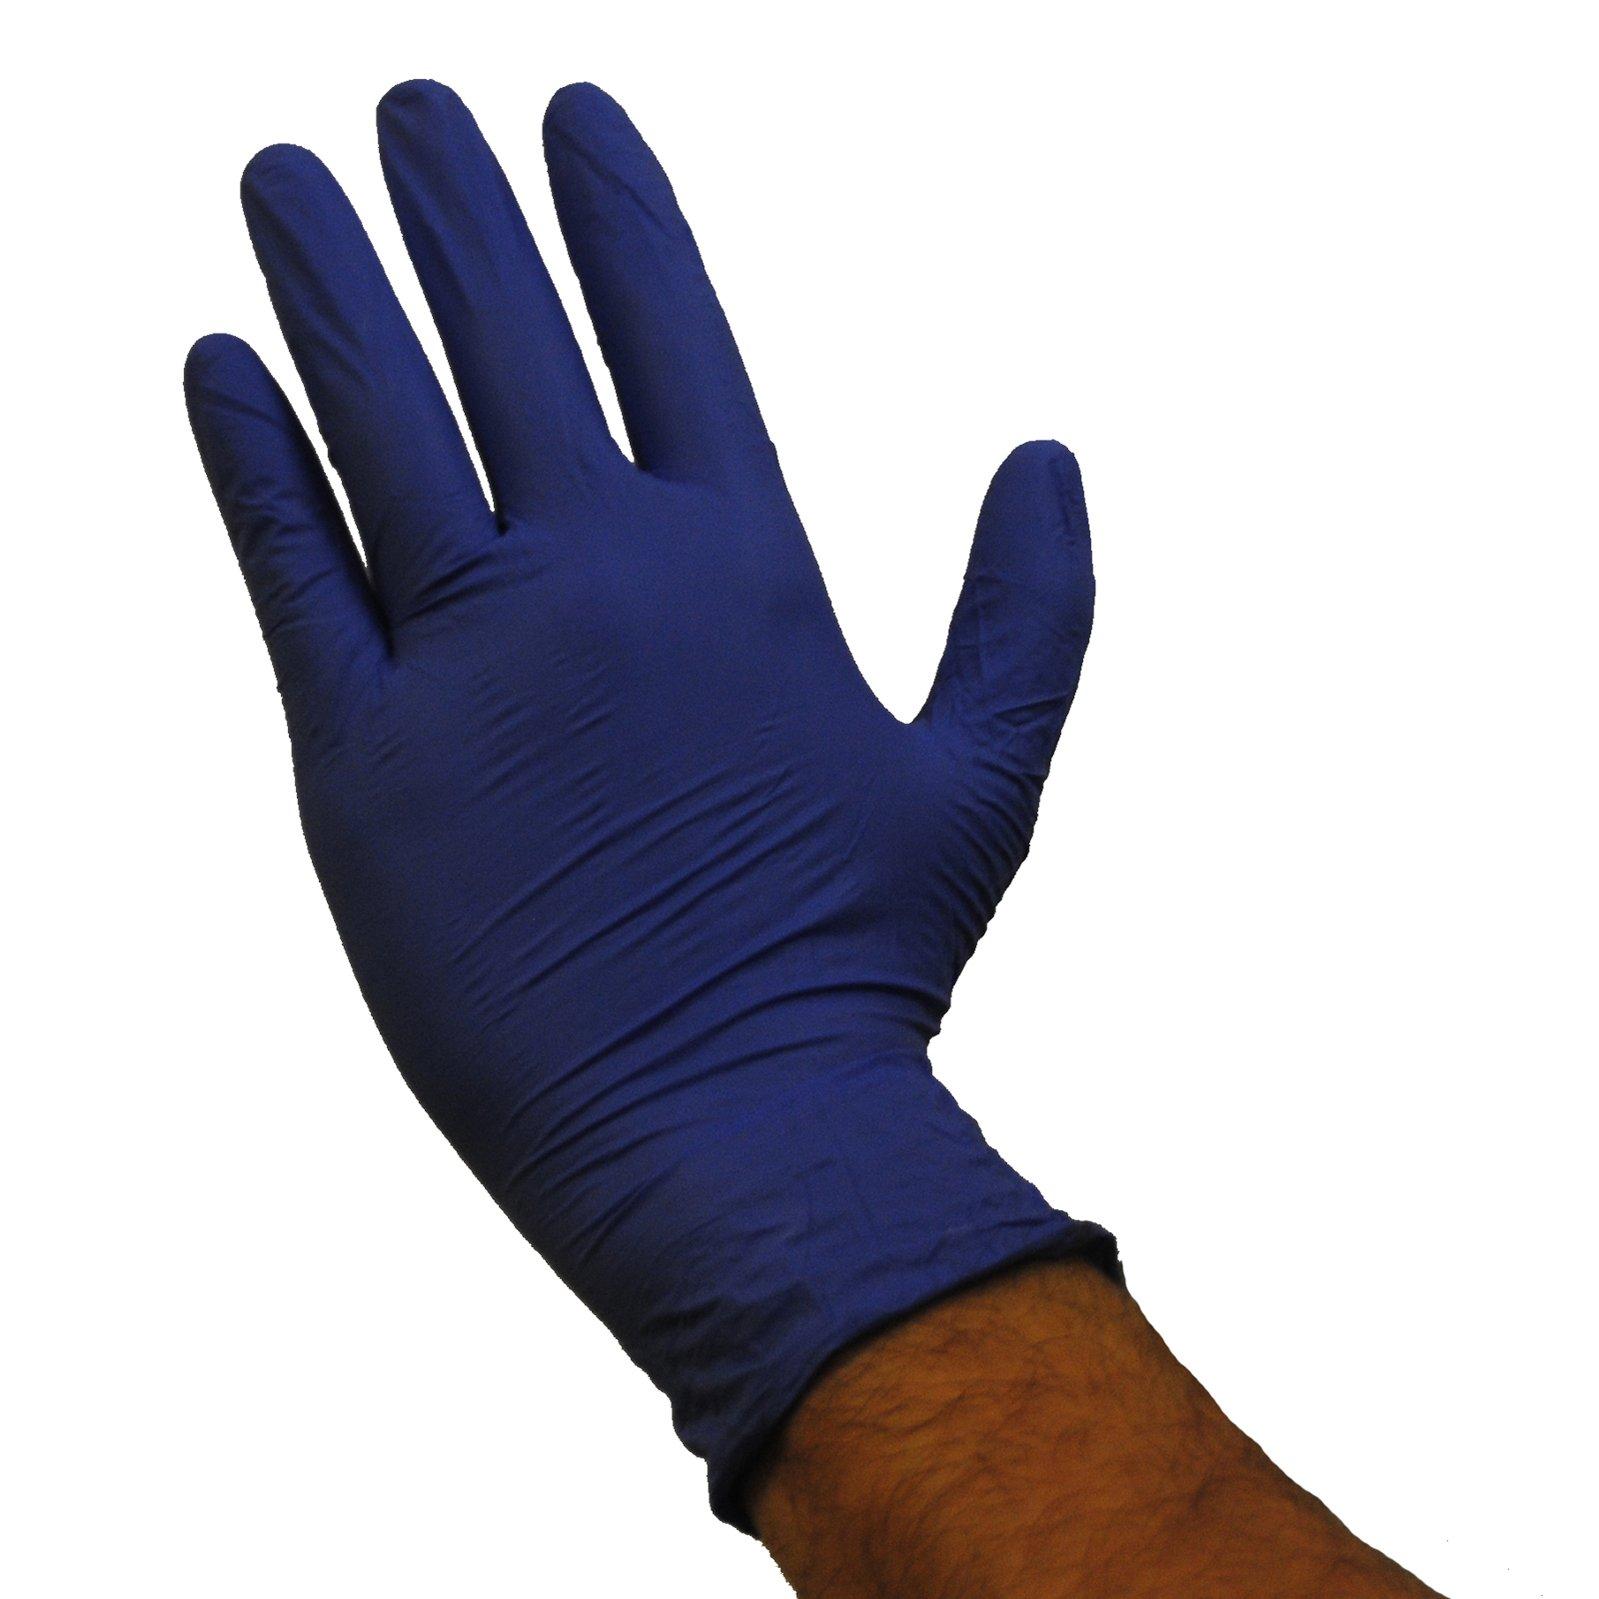 Emerald General Purpose Powder-Free Nitrile Gloves Case Large